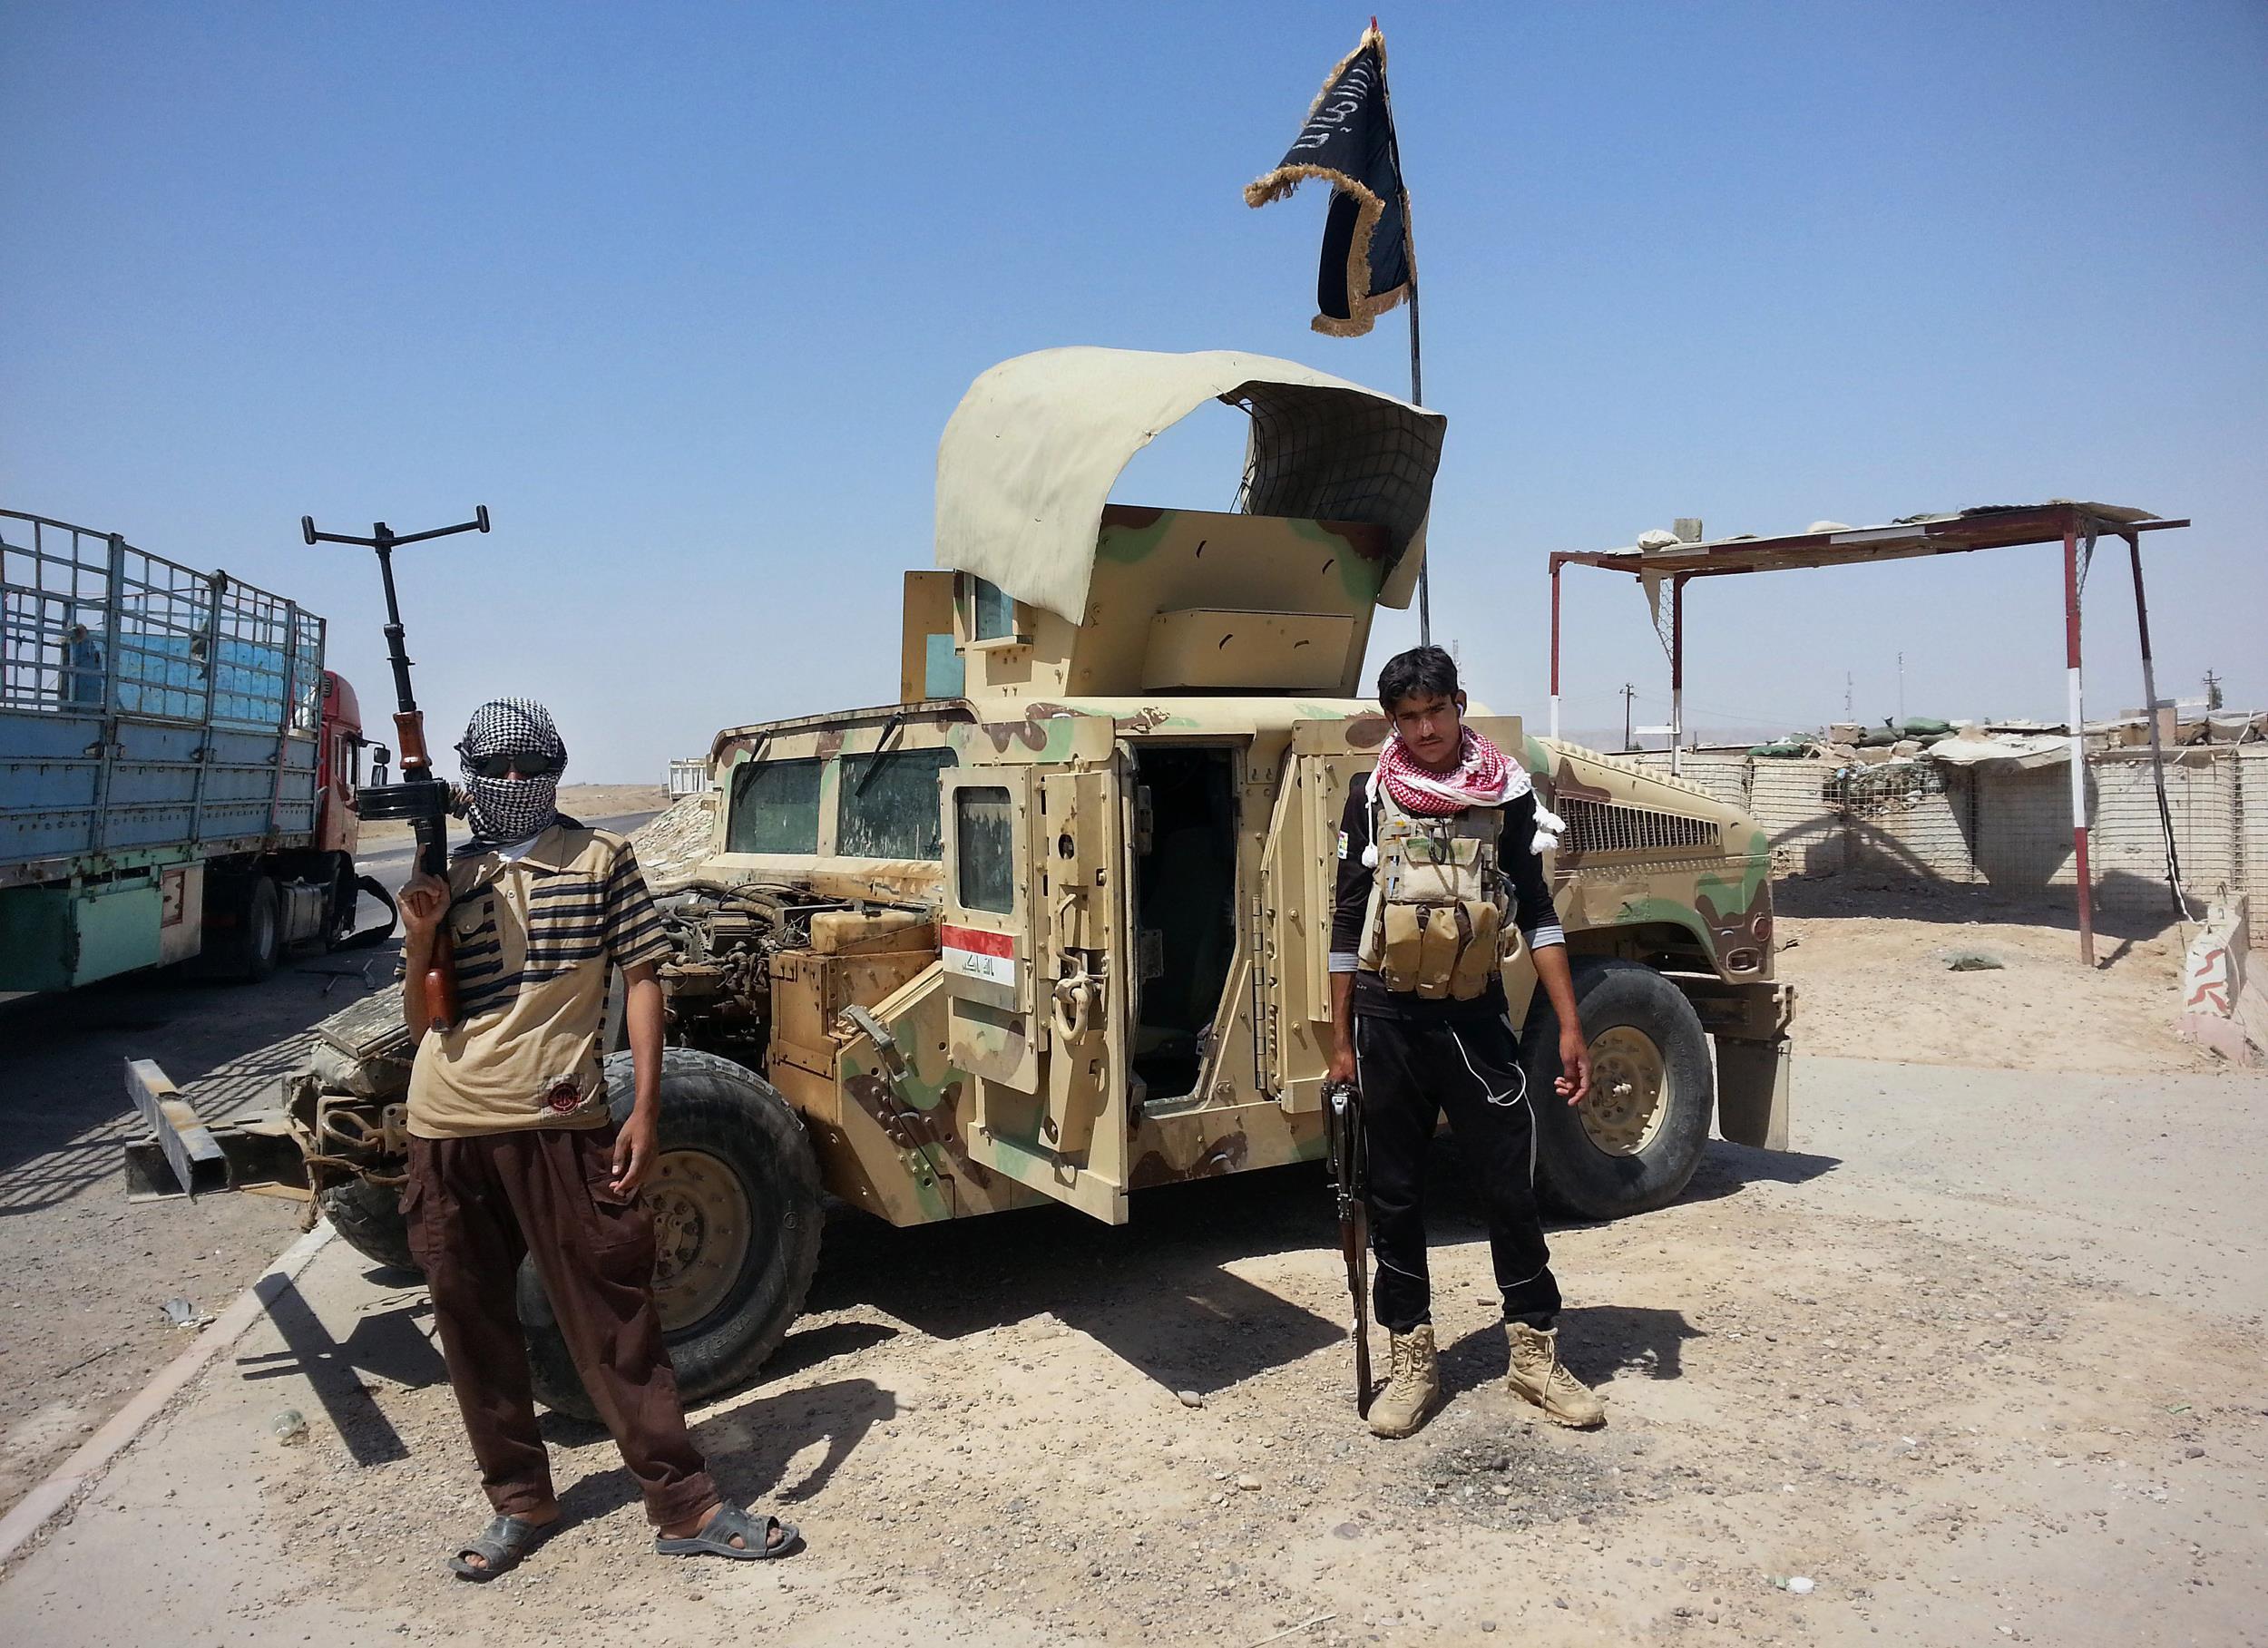 Image: Al-Qaeda inspired militants stand with captured Iraqi Army Humvee